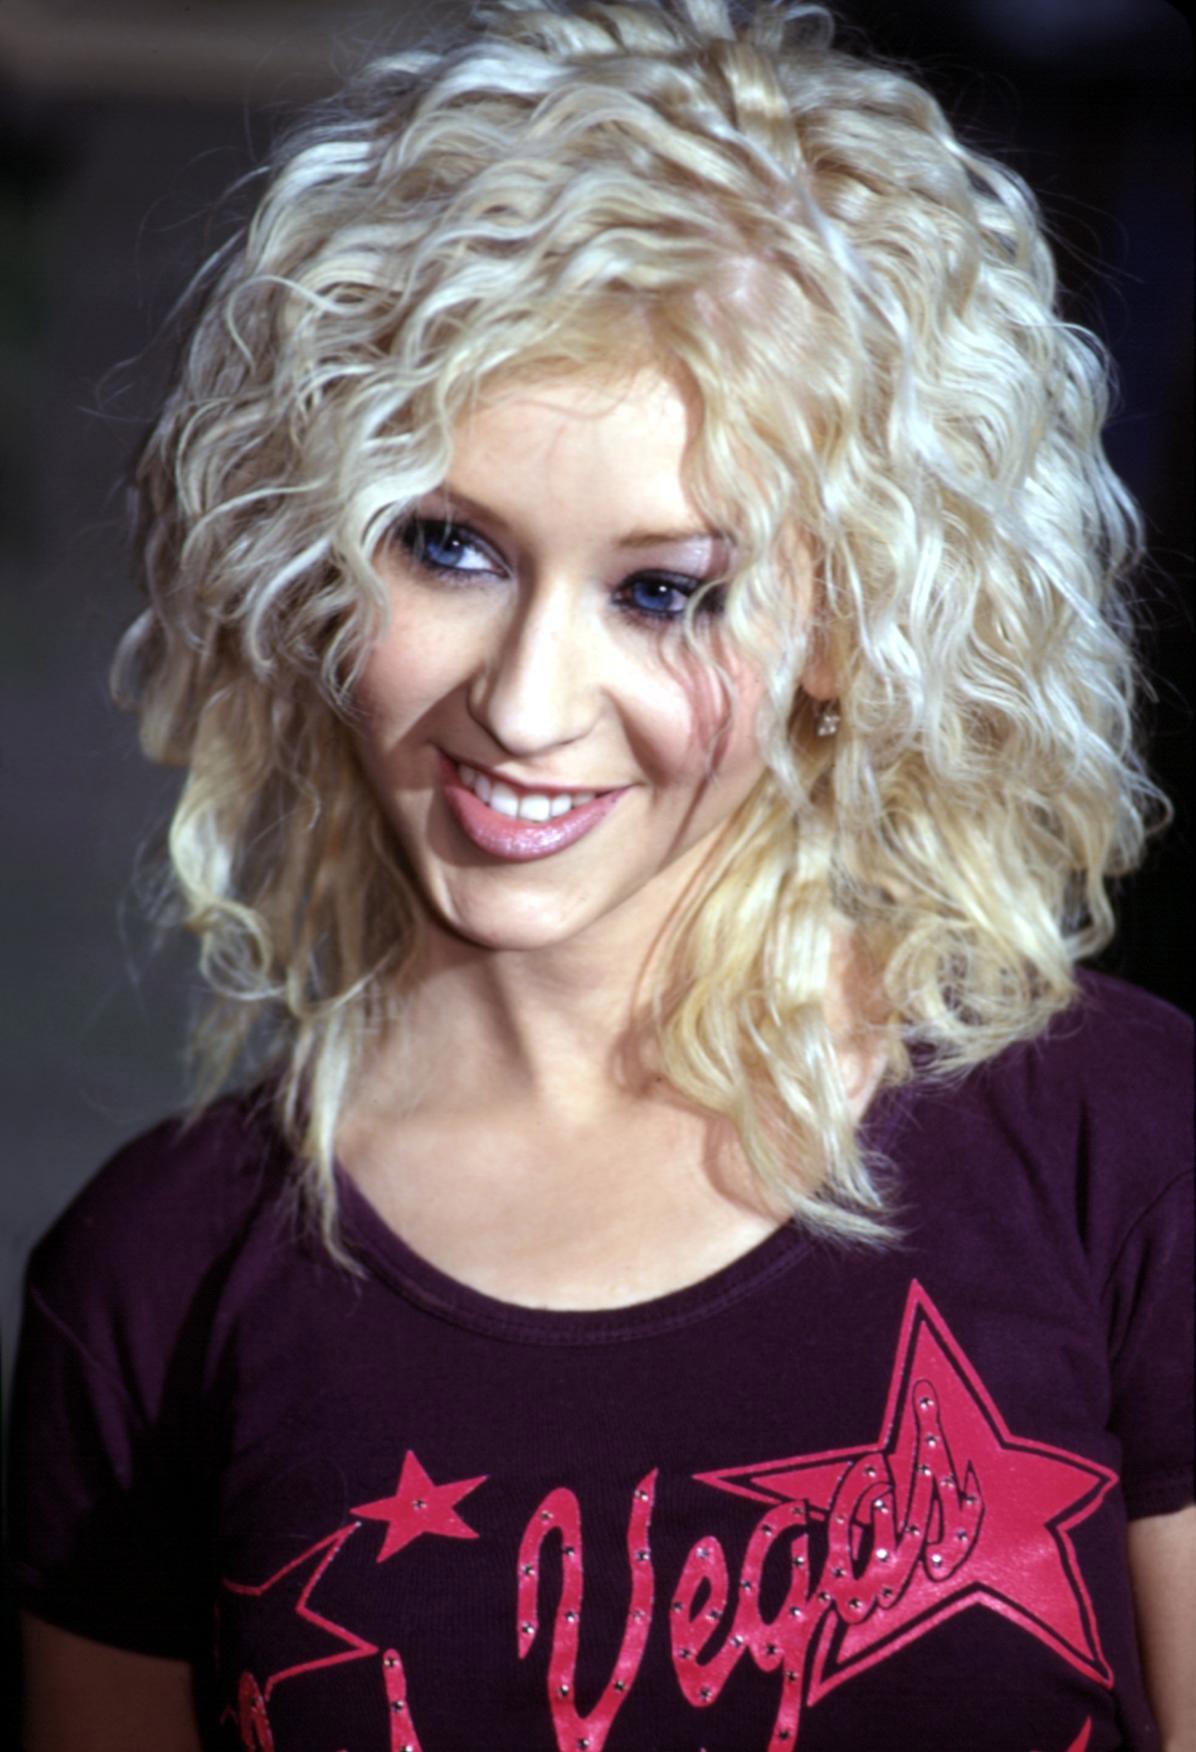 Christina Aguilera at the Billboard Music Awards in Las Vegas, December, 1999, Image: 98317101, License: Rights-managed, Restrictions: For usage credit please use; Robert Hepler/Everett Collection, Model Release: no, Credit line: Profimedia, Everett